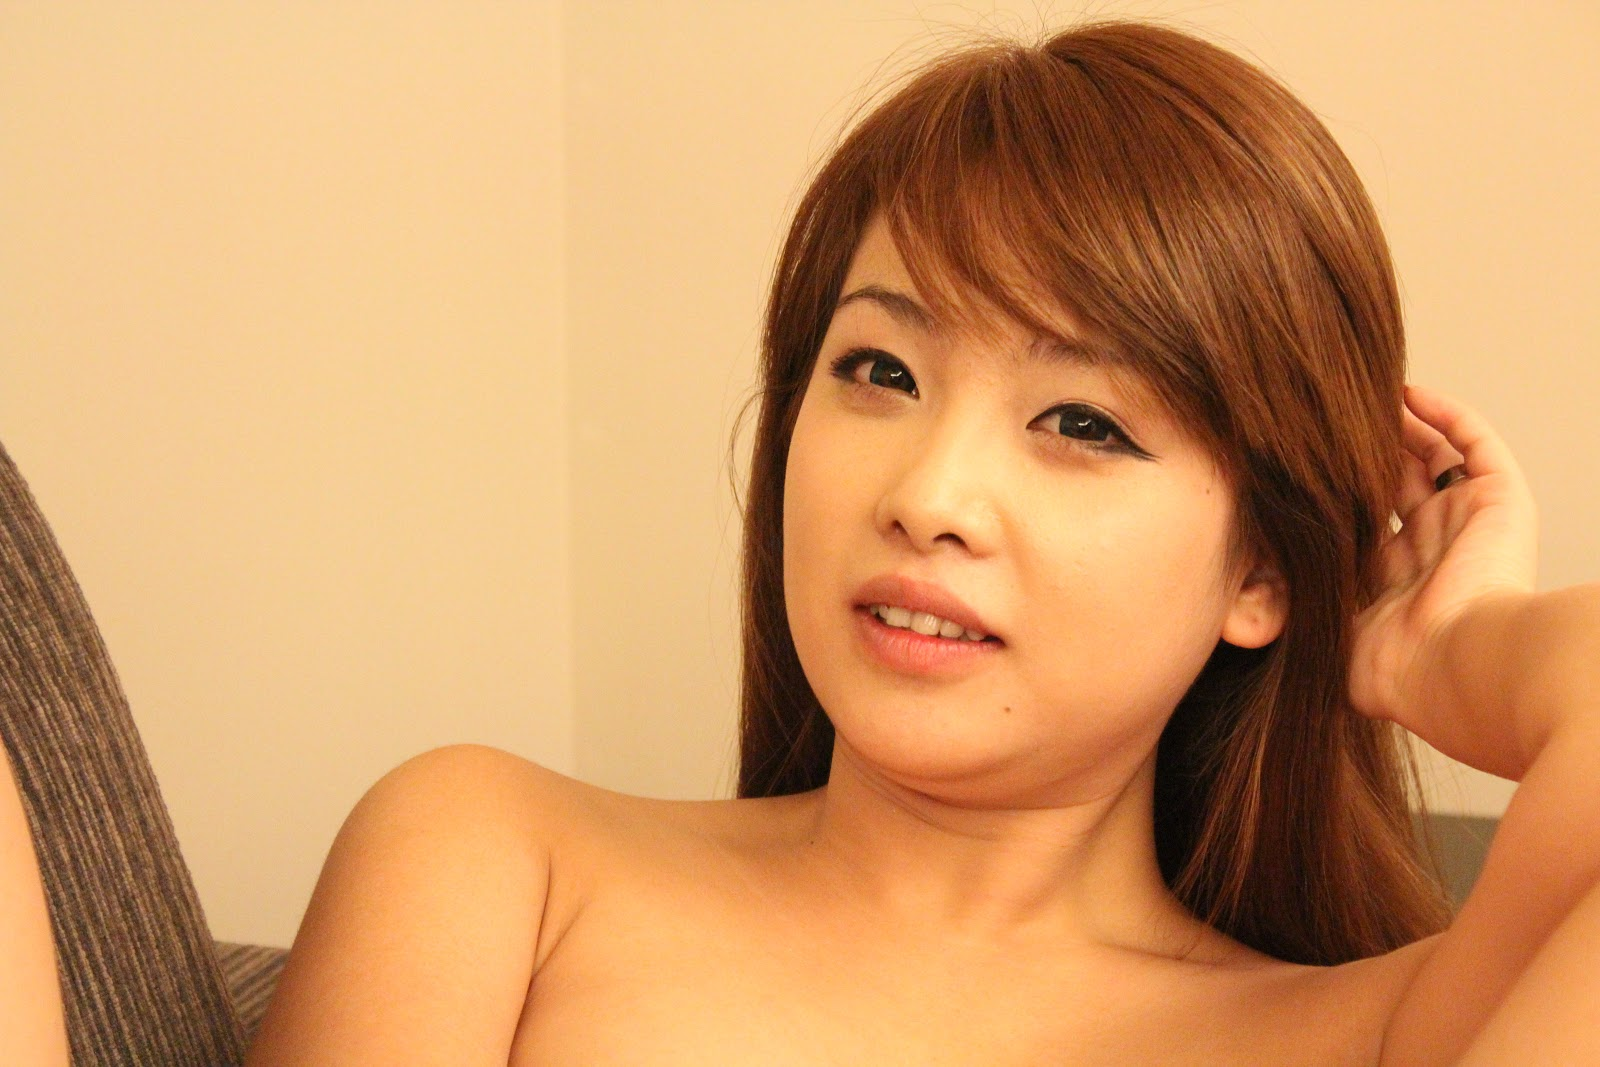 Chinese Nude_Art_Photos_-_288_-_YouDi_Vol_2.rar chinese 07040